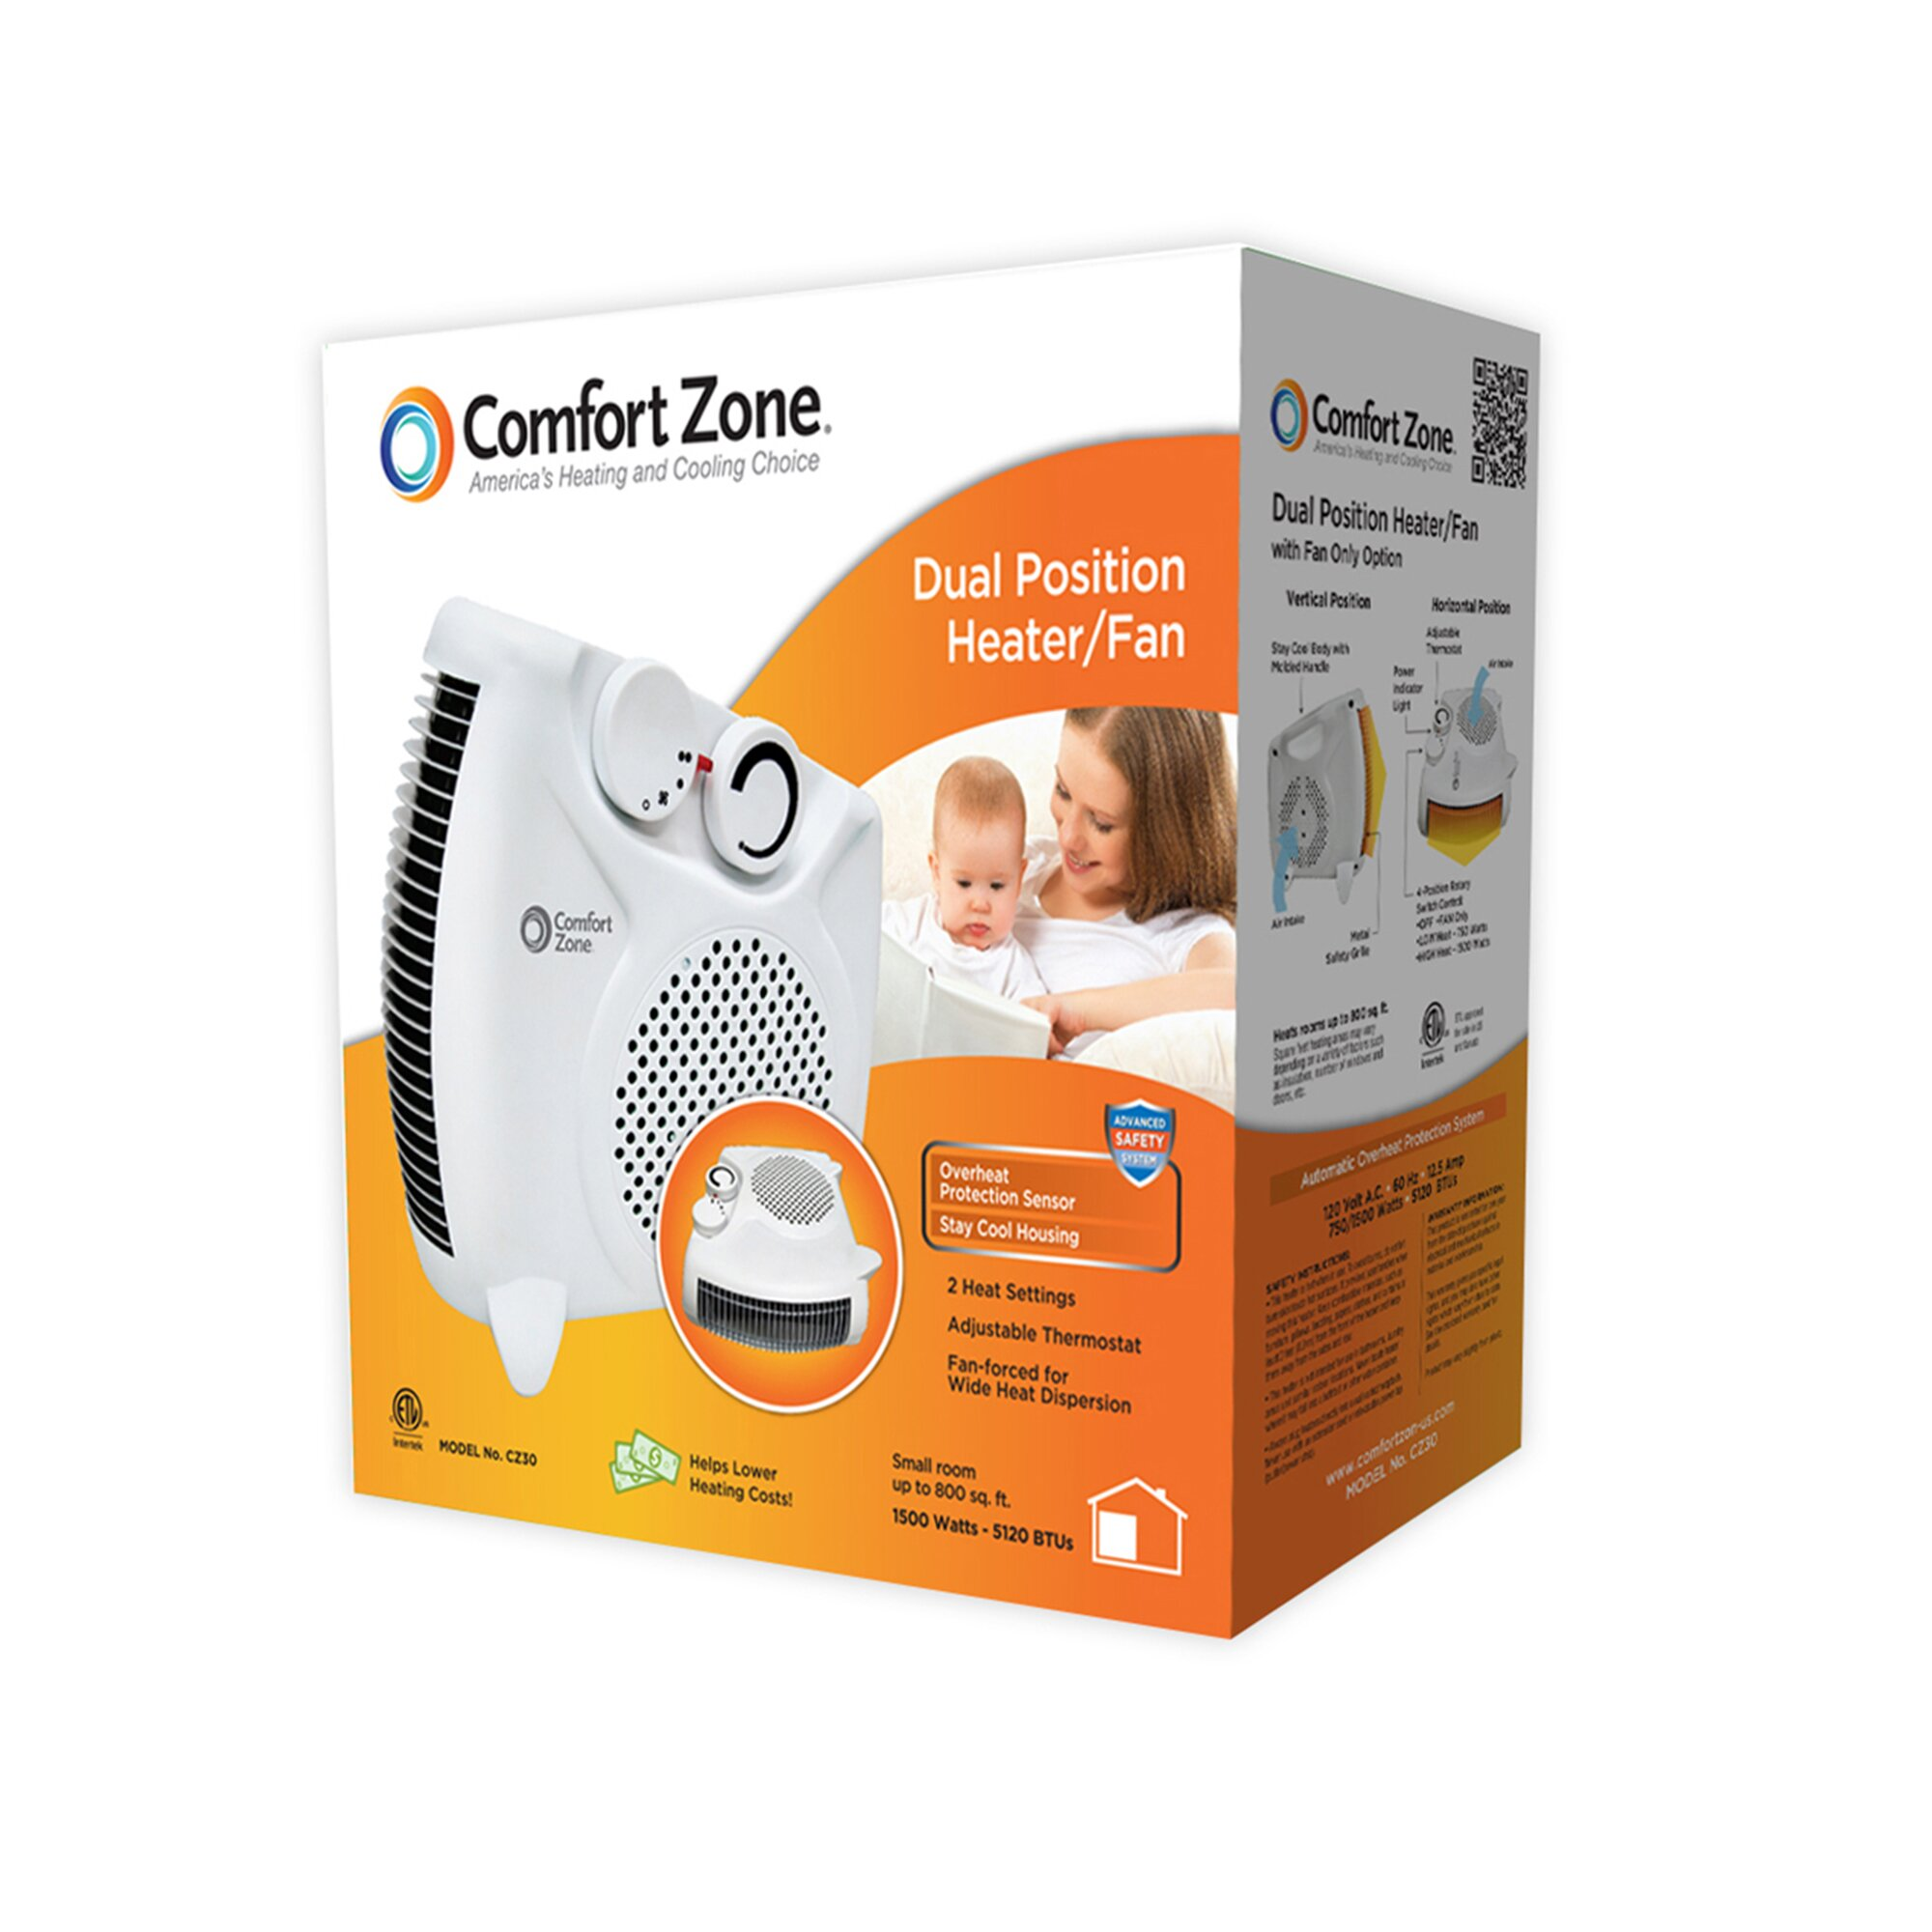 Comfort Zone 1 500 Watt Portable Electric Dual Position